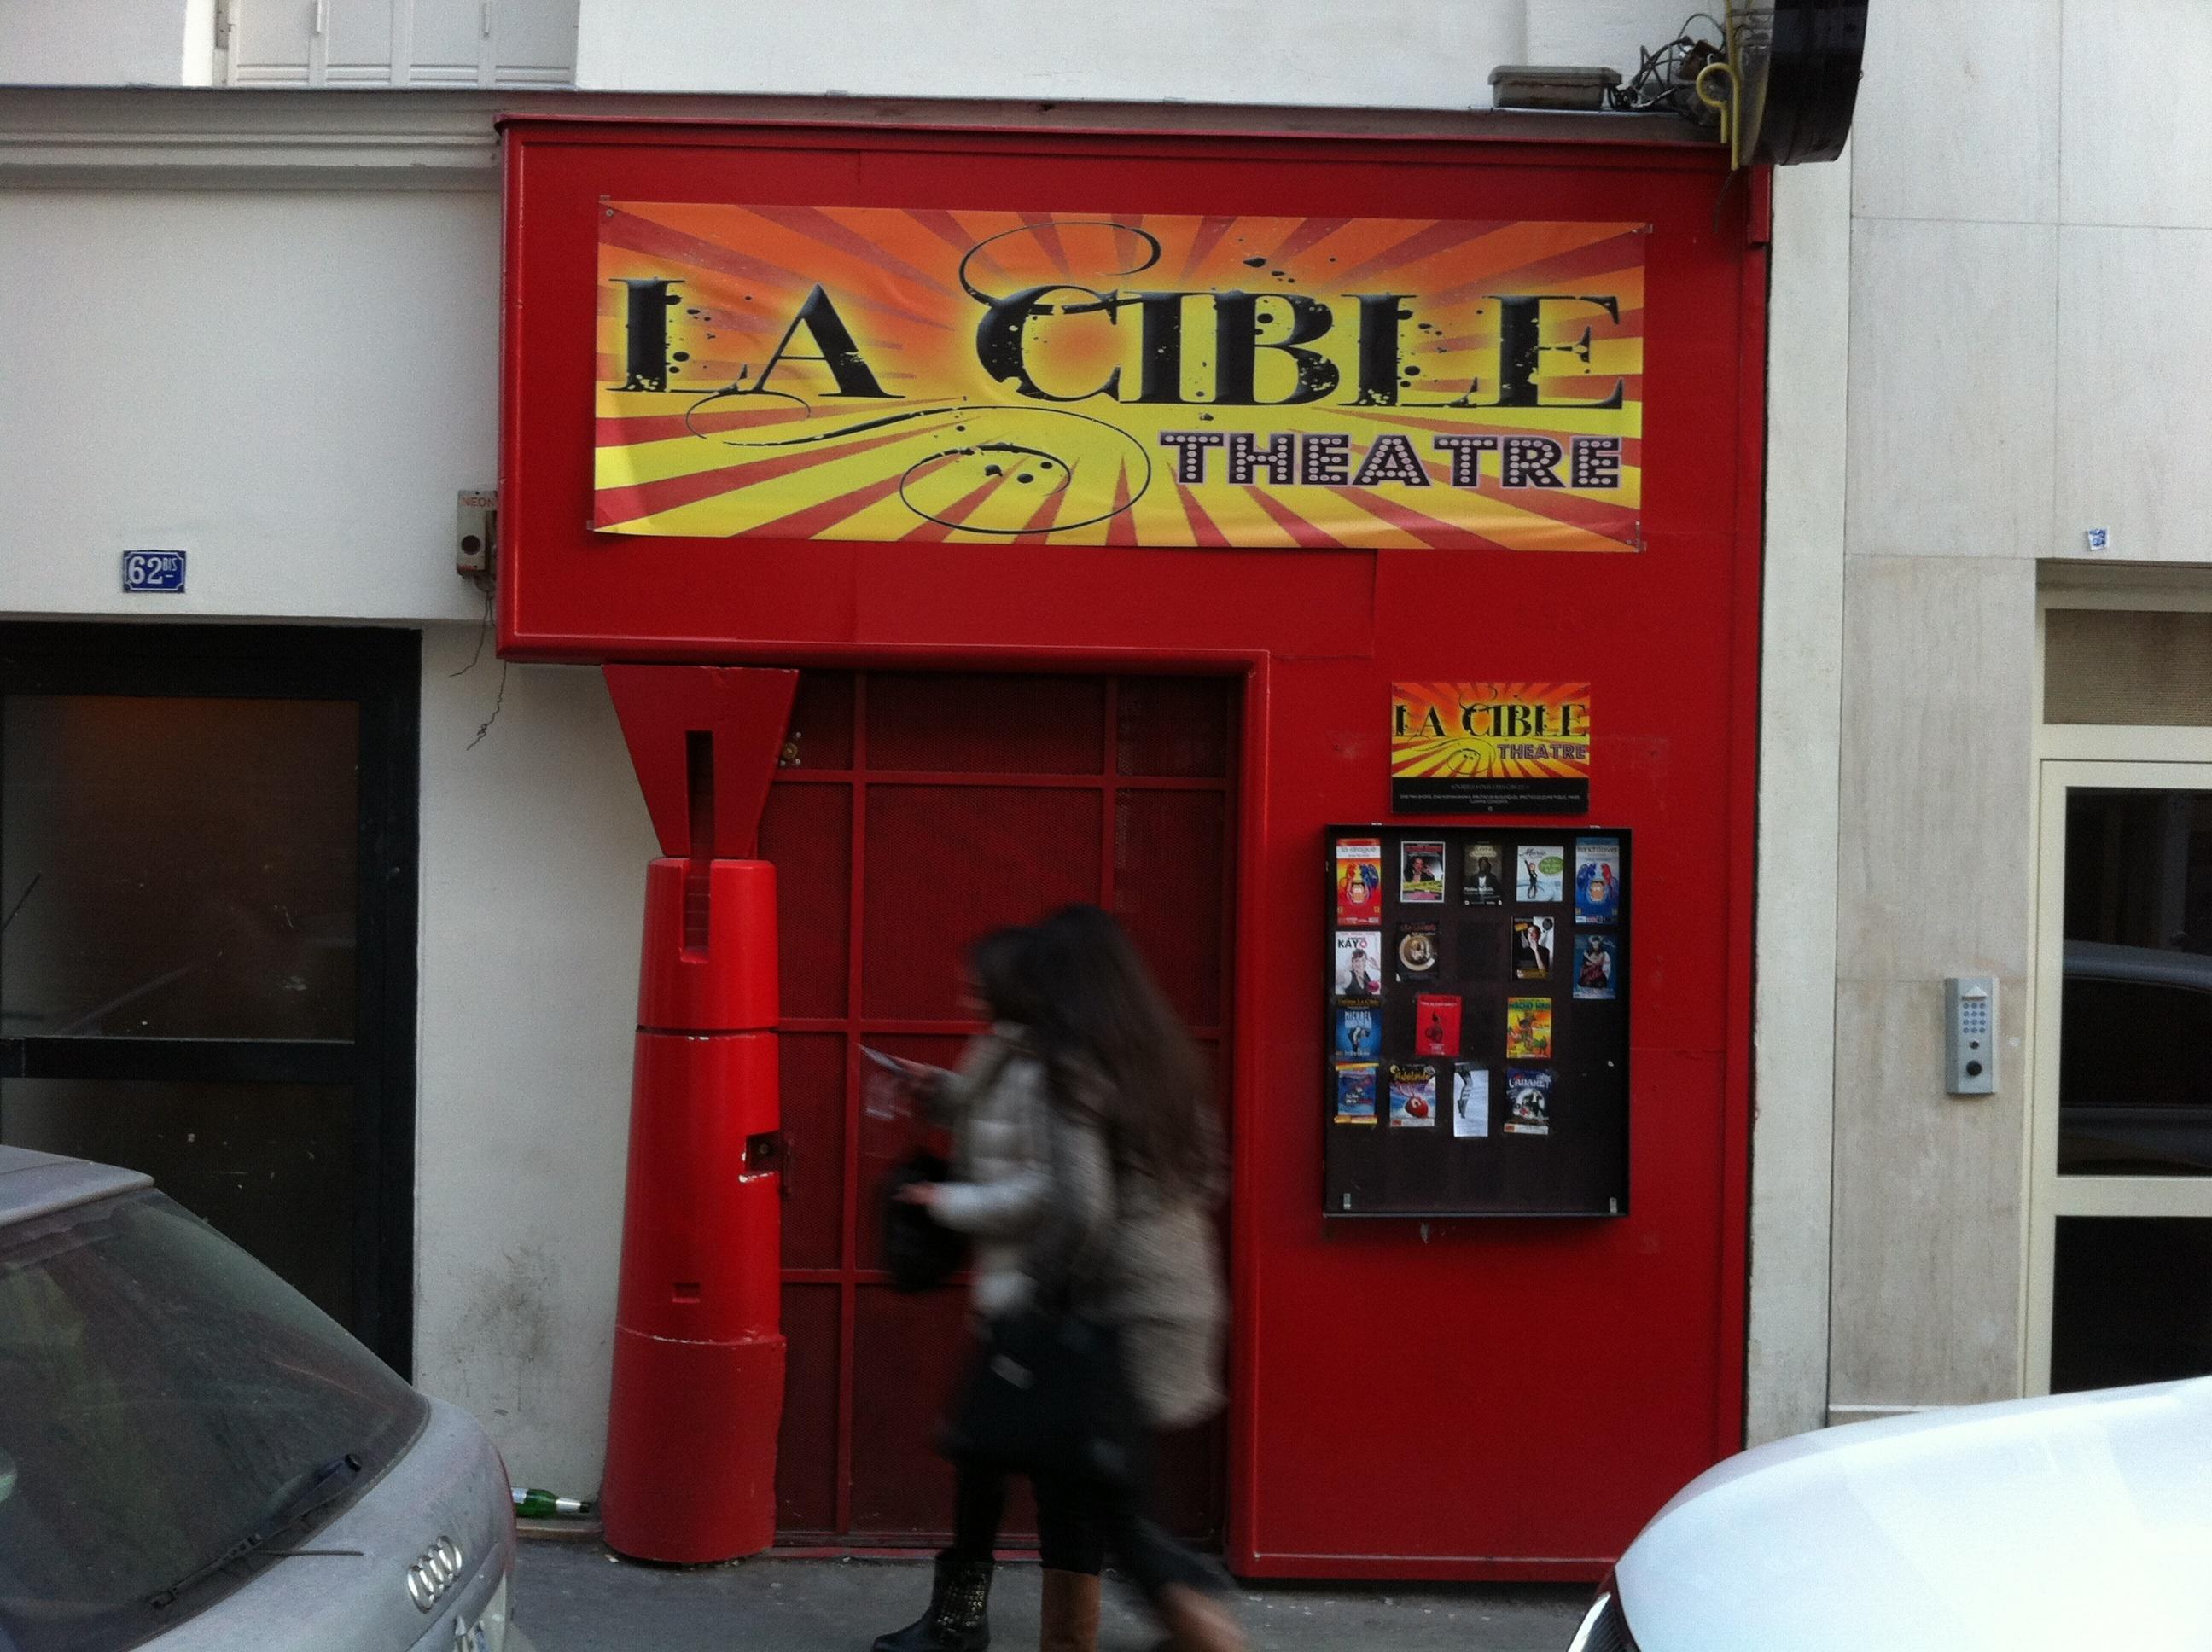 Théâtre La Cible